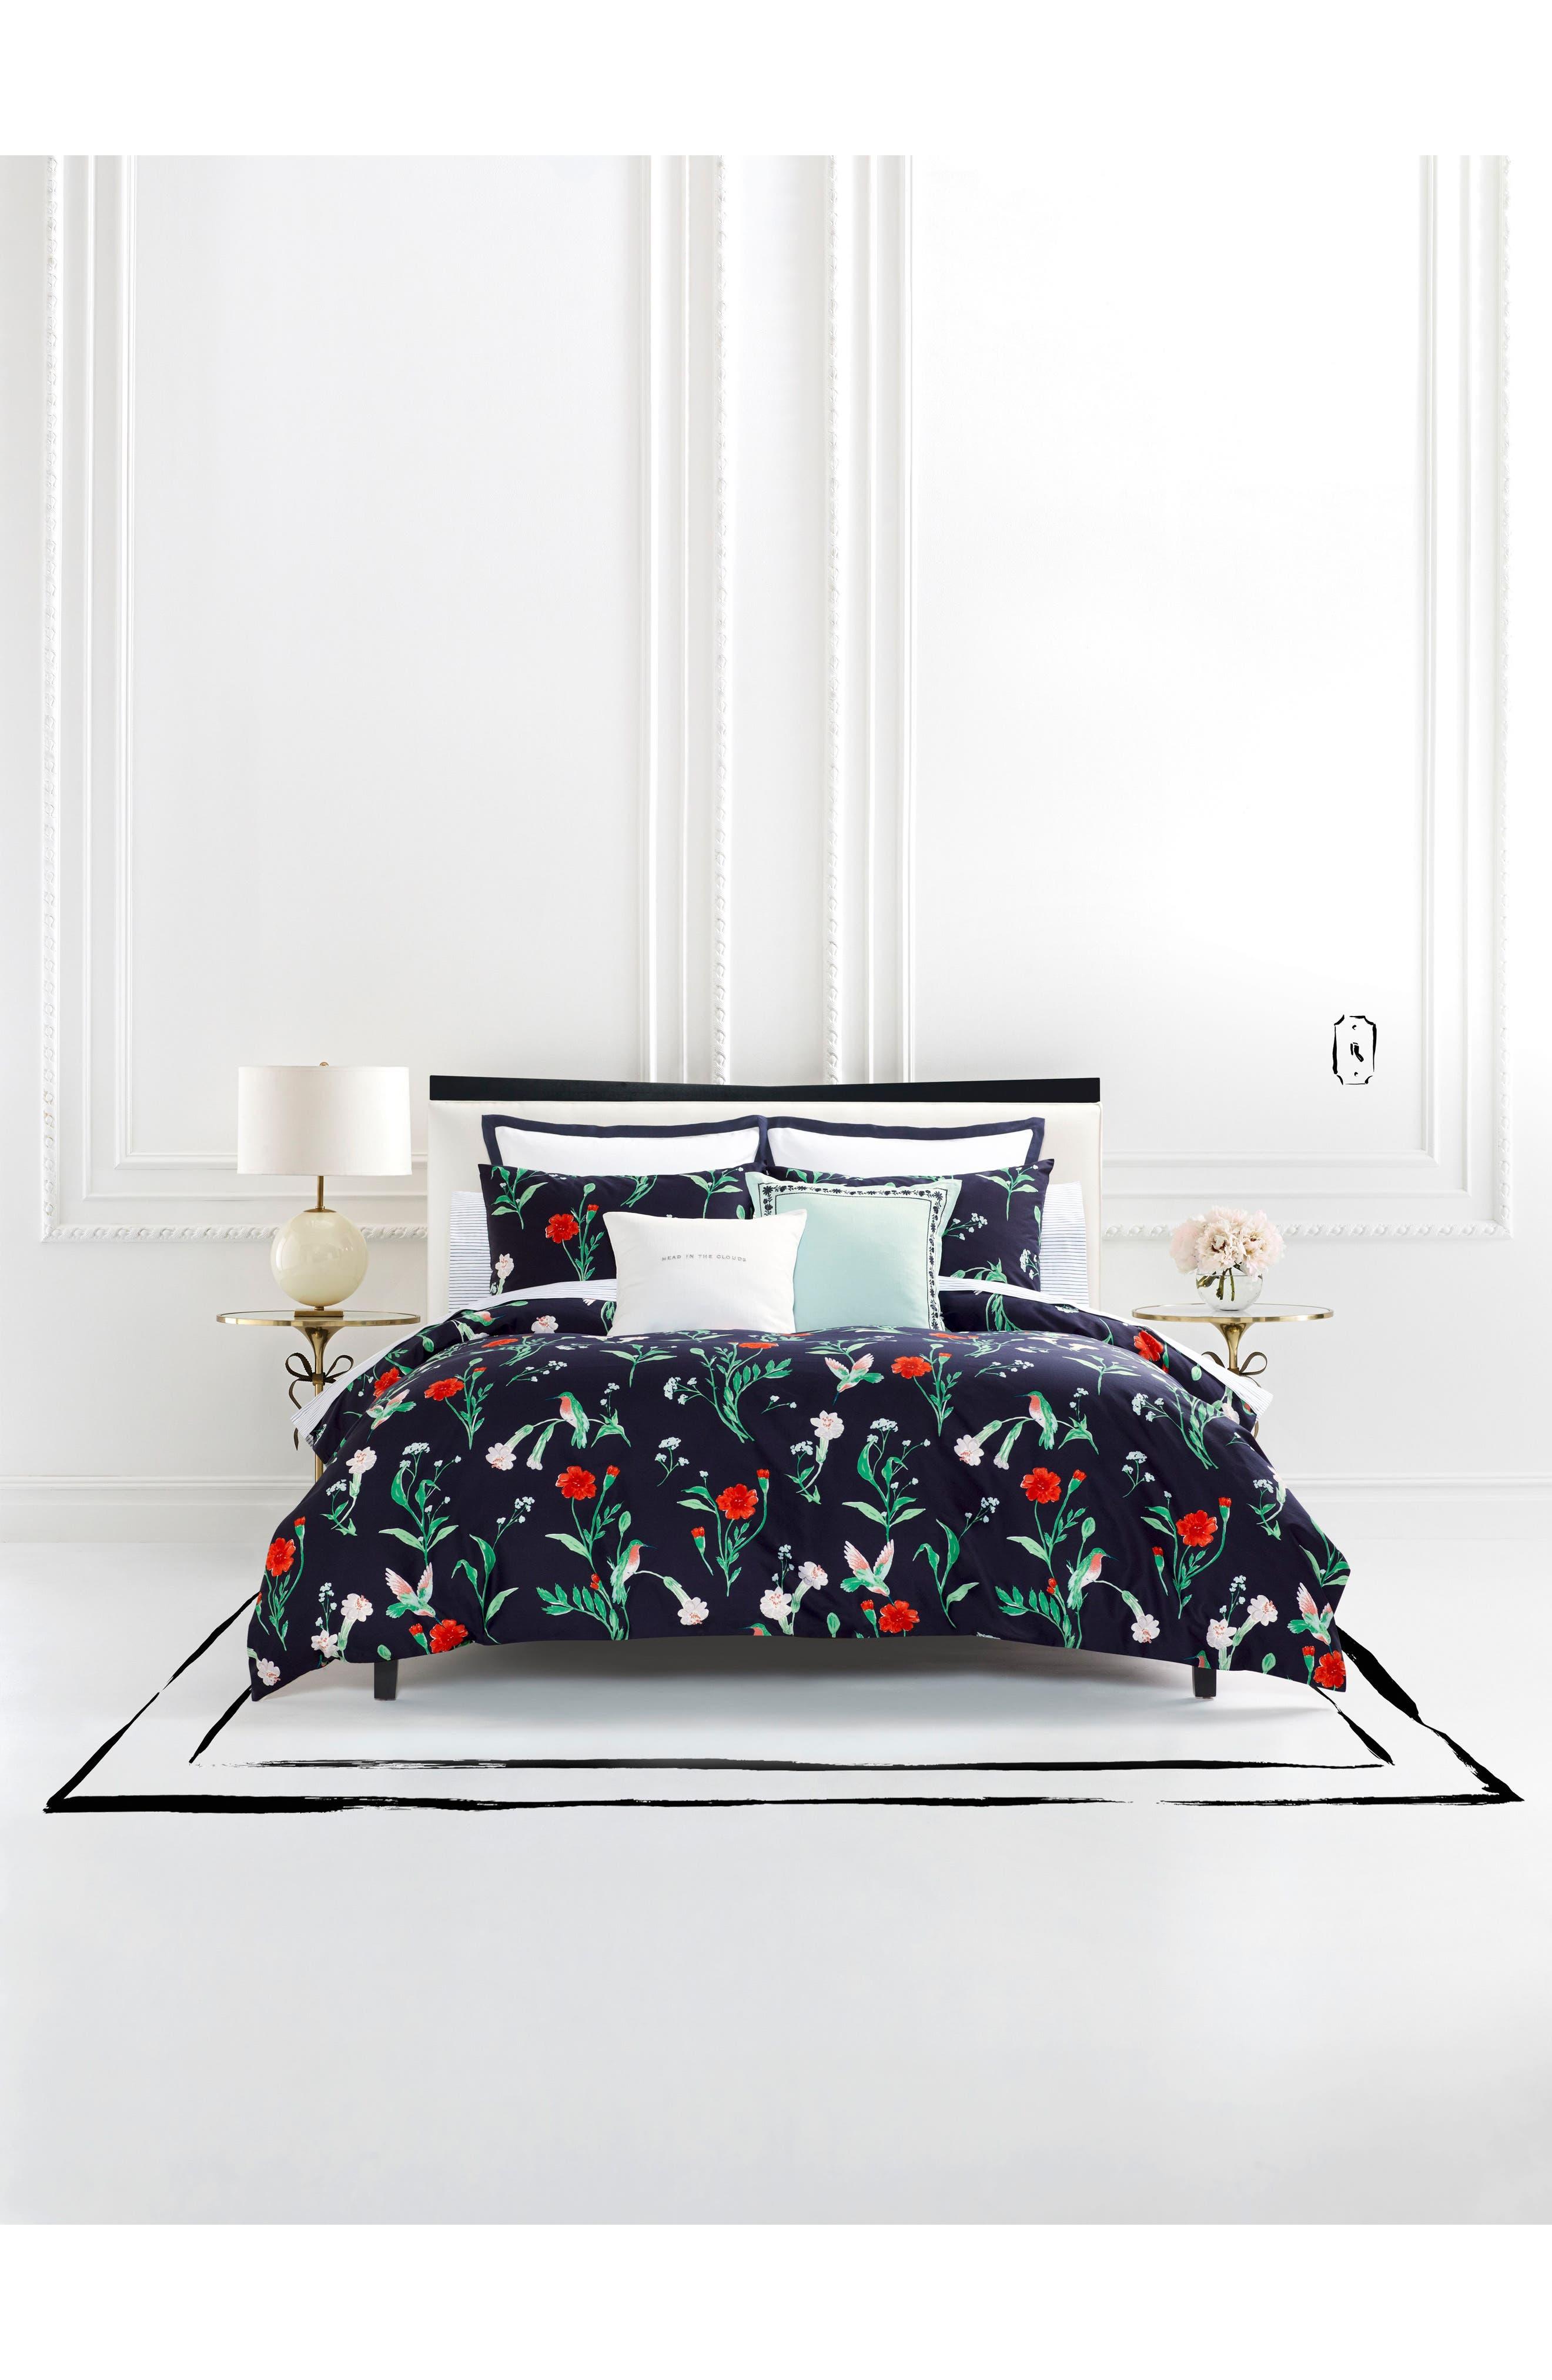 kate spade new york hummingbird comforter & sham set